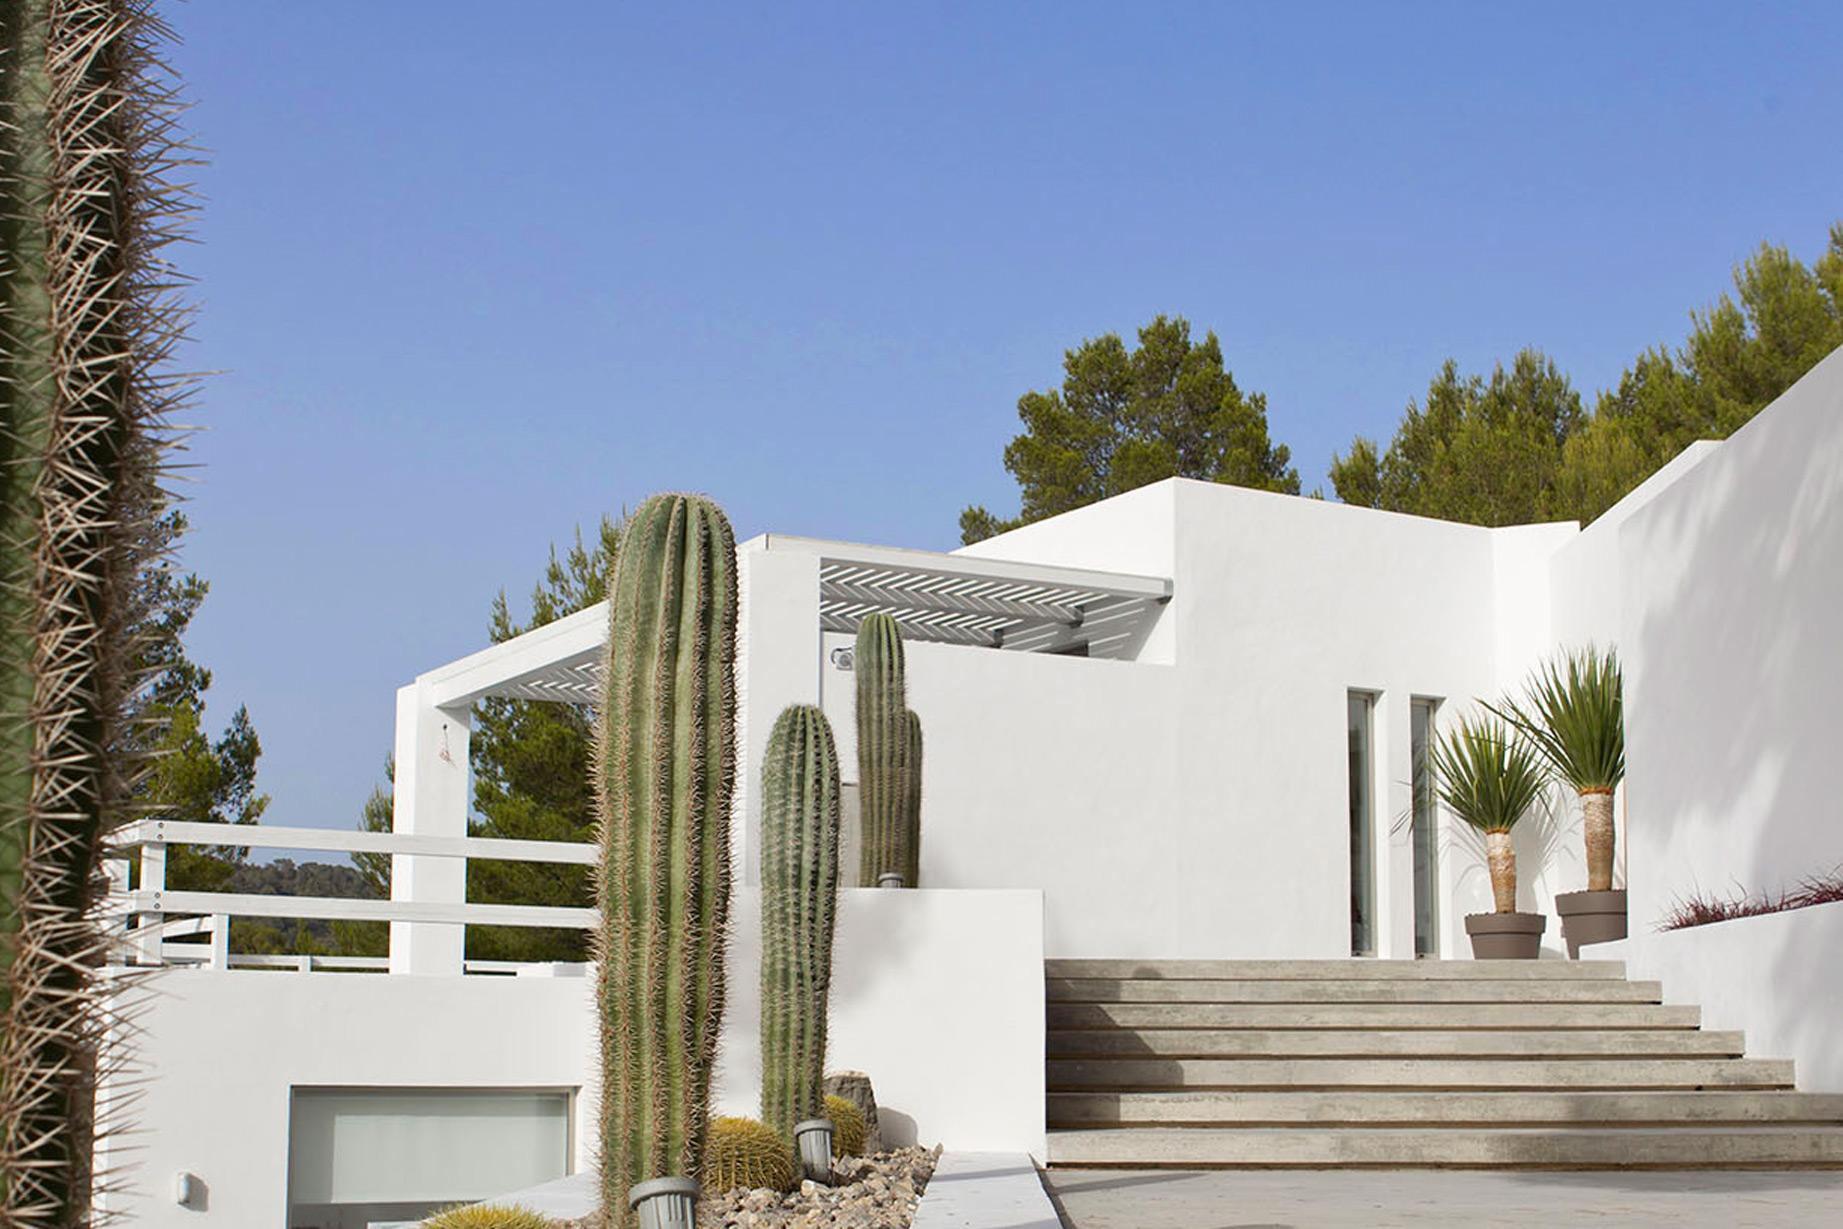 Alquiler de Chalet en Cala Tarida - Ibiza (Ref. 818) - 14